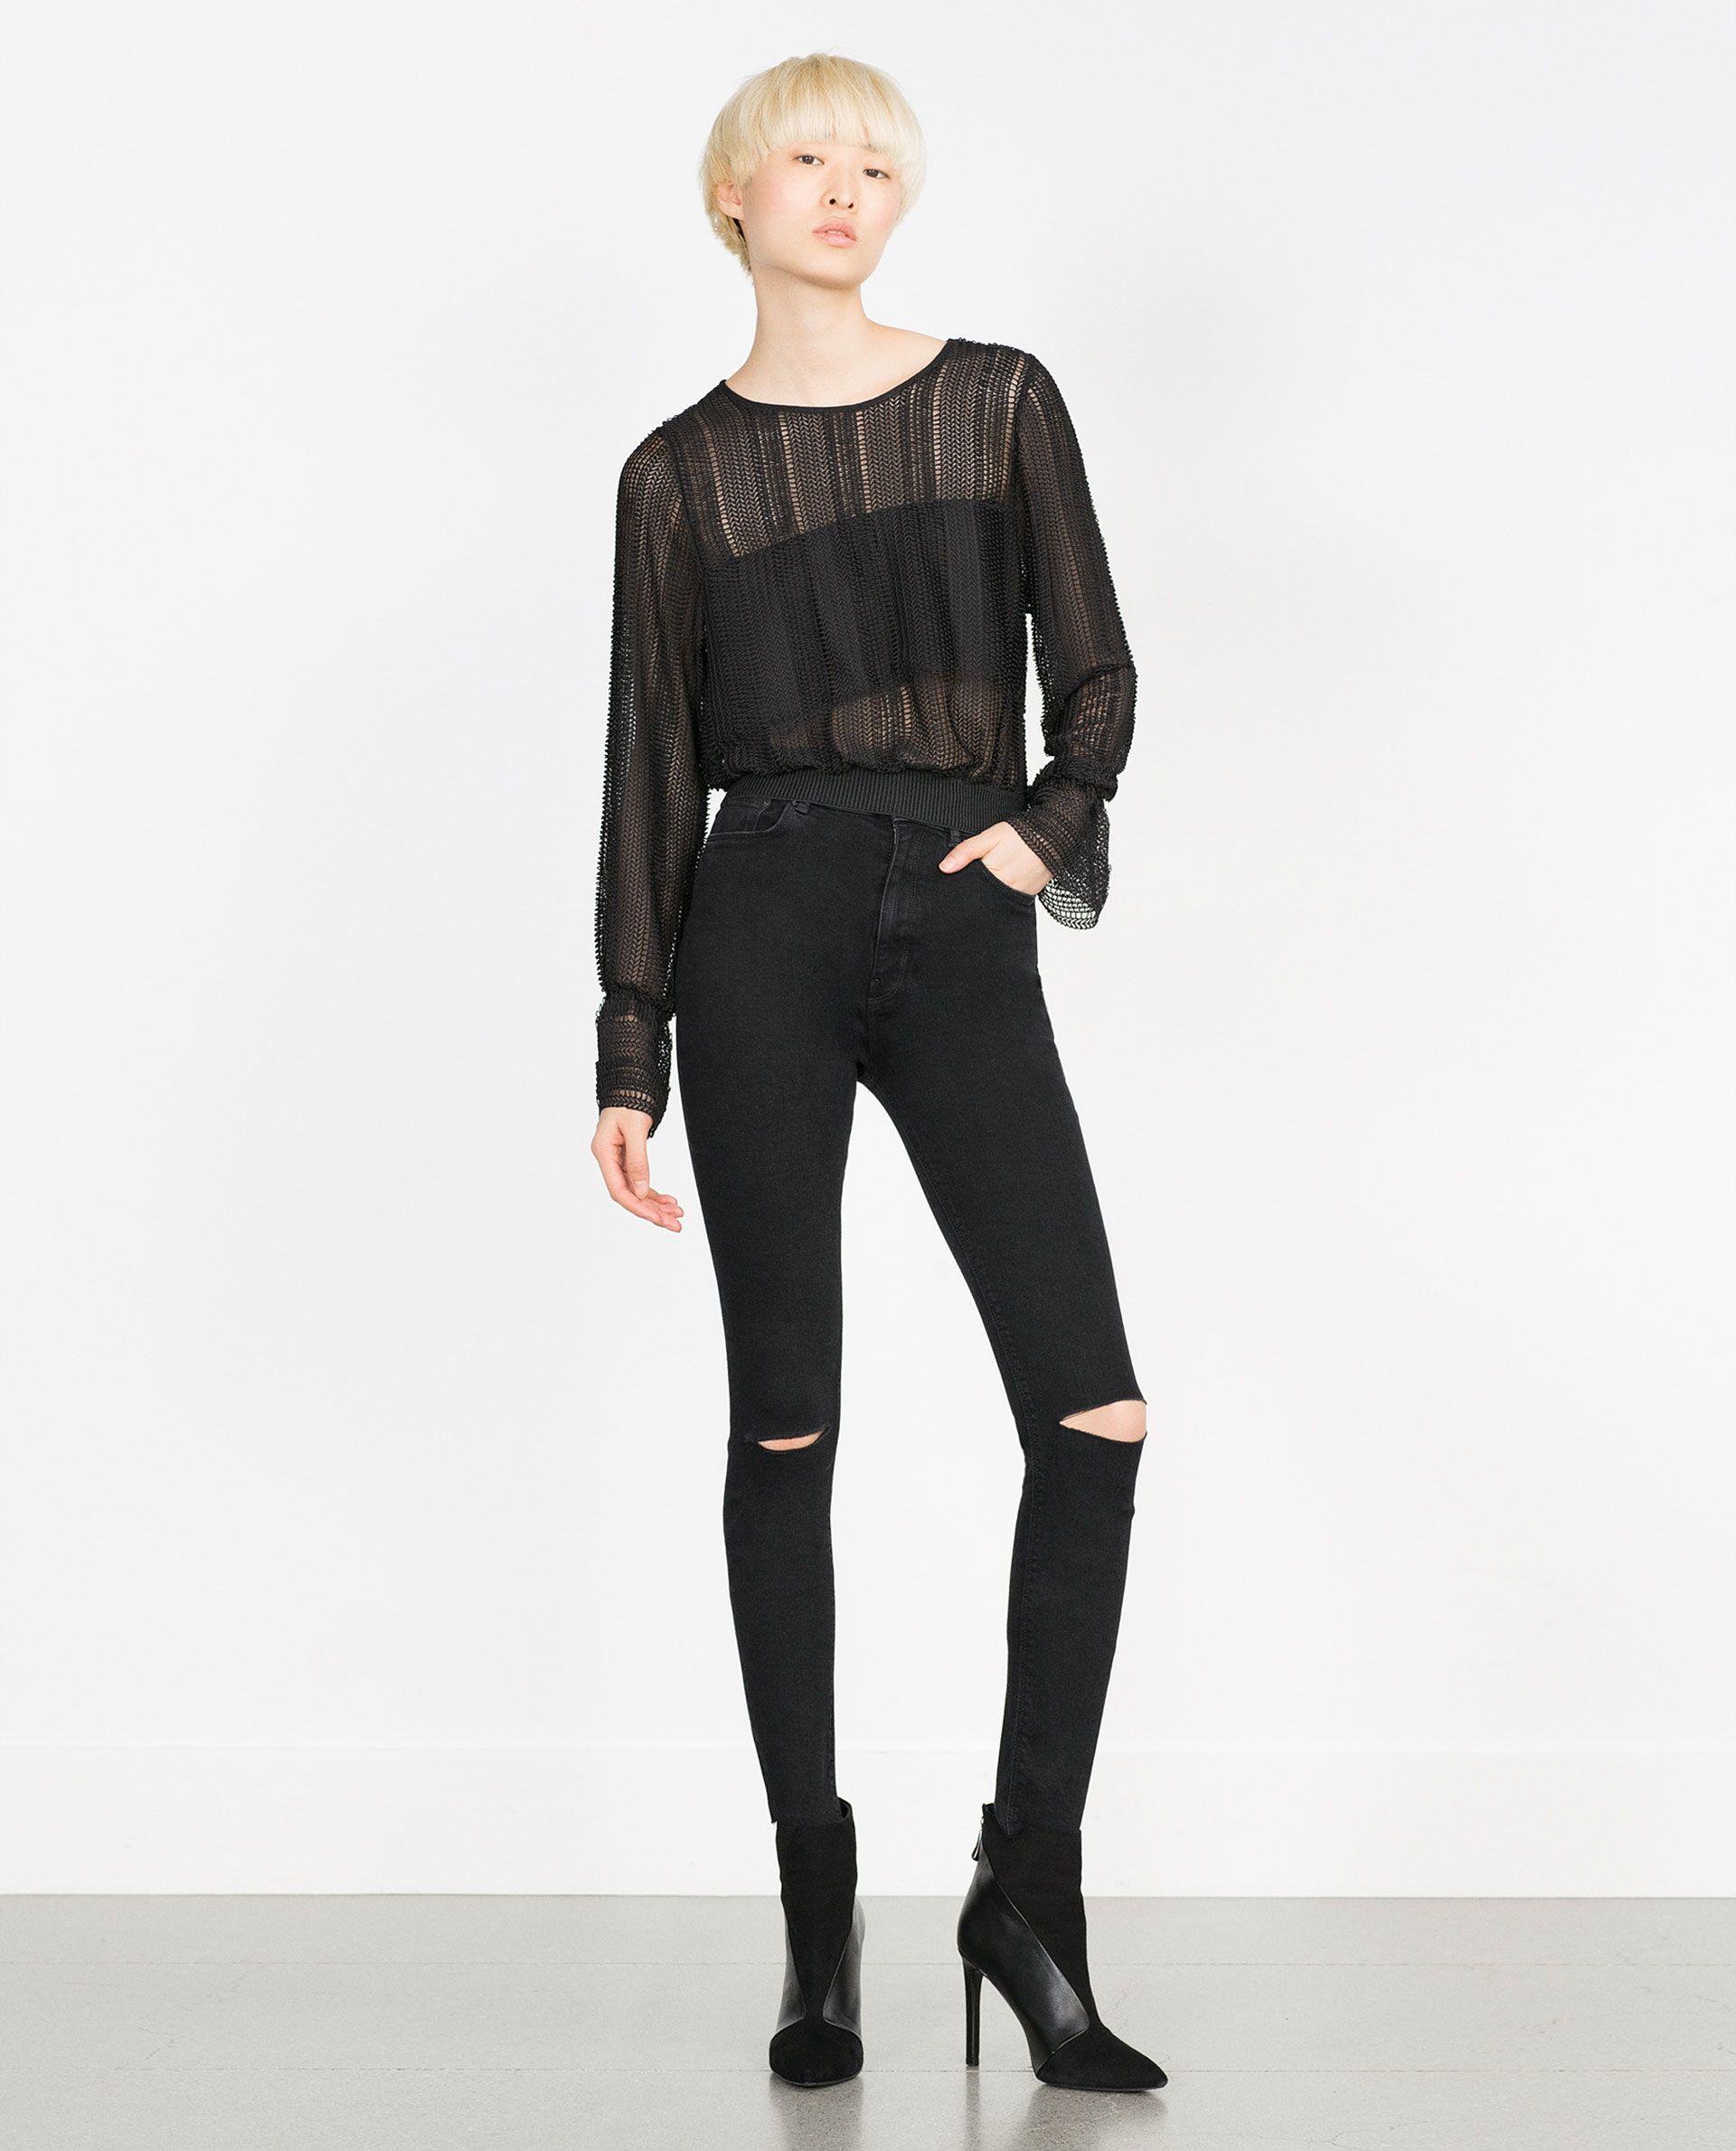 101d7a79 Pin by symone Jackson on Net a porter Style. | High waist jeans ...